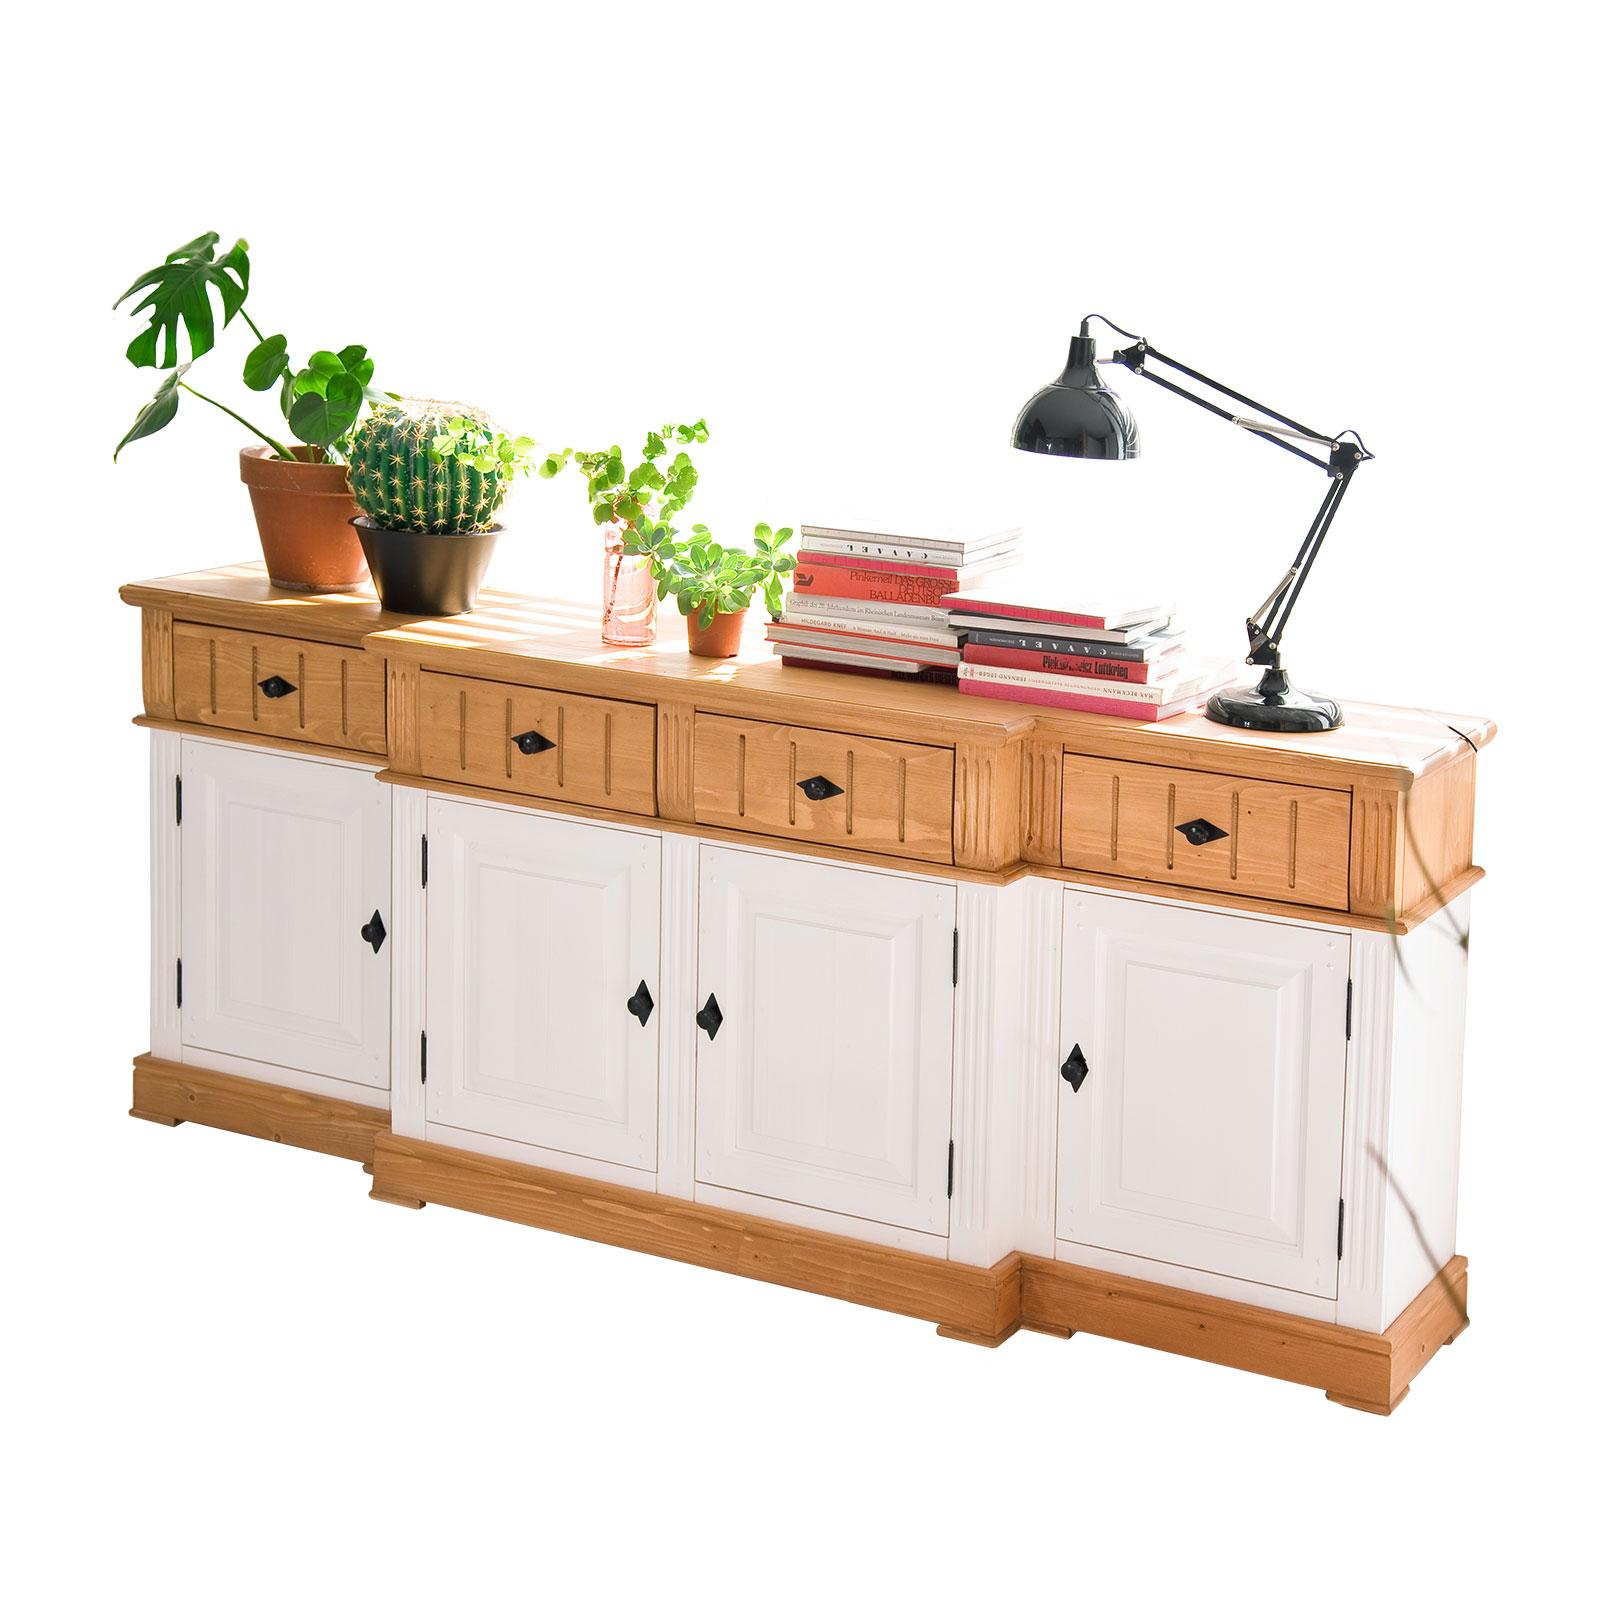 sideboard alby wei natur 210 cm breit pinie massiv. Black Bedroom Furniture Sets. Home Design Ideas